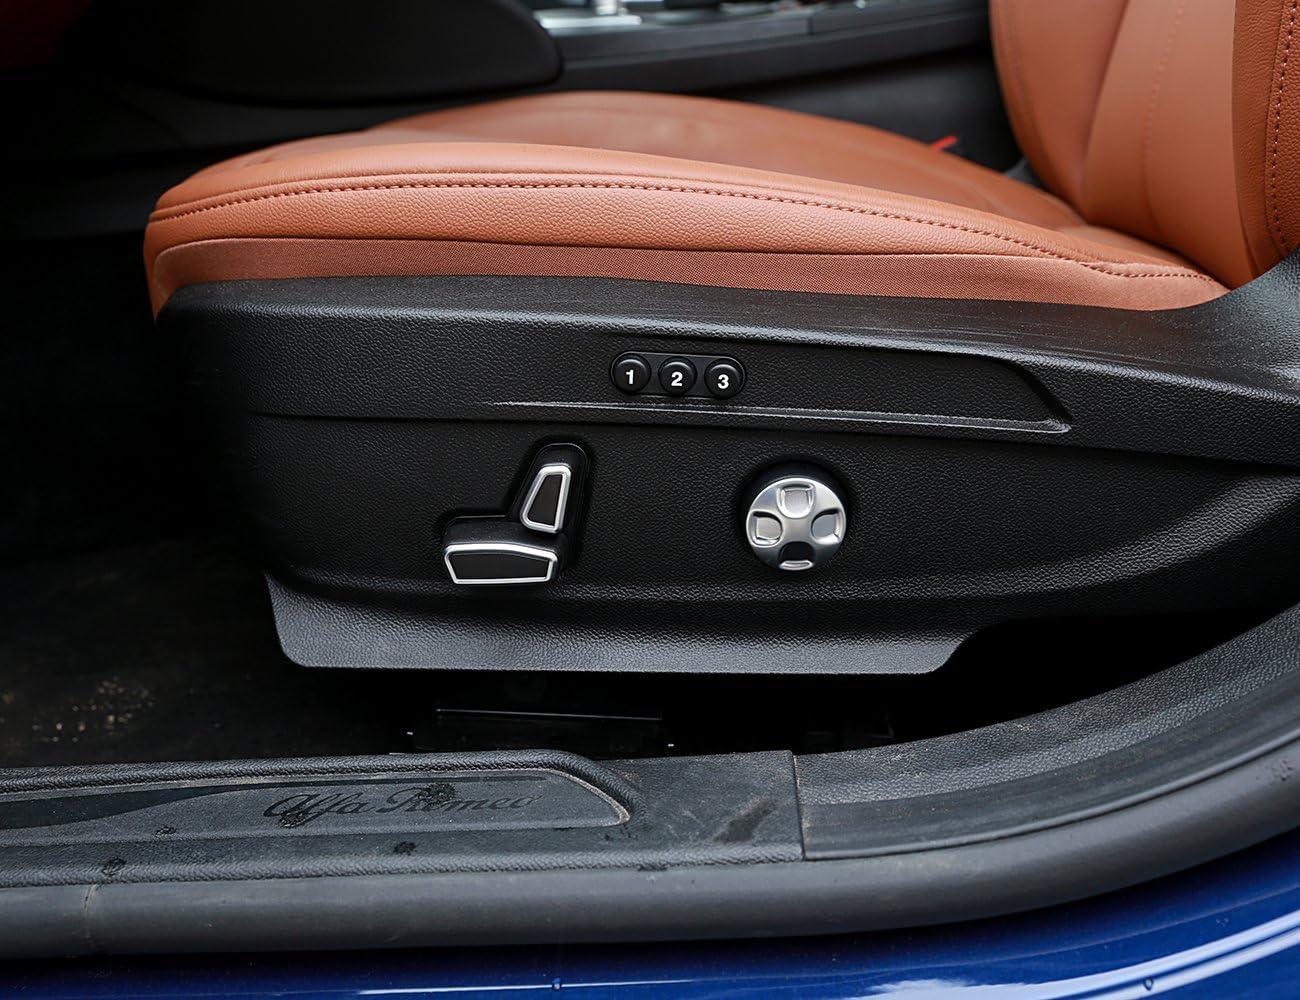 LLKUANG for Maserati Levante 2016 2017 Ghibli 2014-2017 Quattroporte 2013-2017 6pcs/Set ABS Chrome Seat Adjustment Button Cover Trim for Alfa Romeo Giulia Stelvio 2017 2018